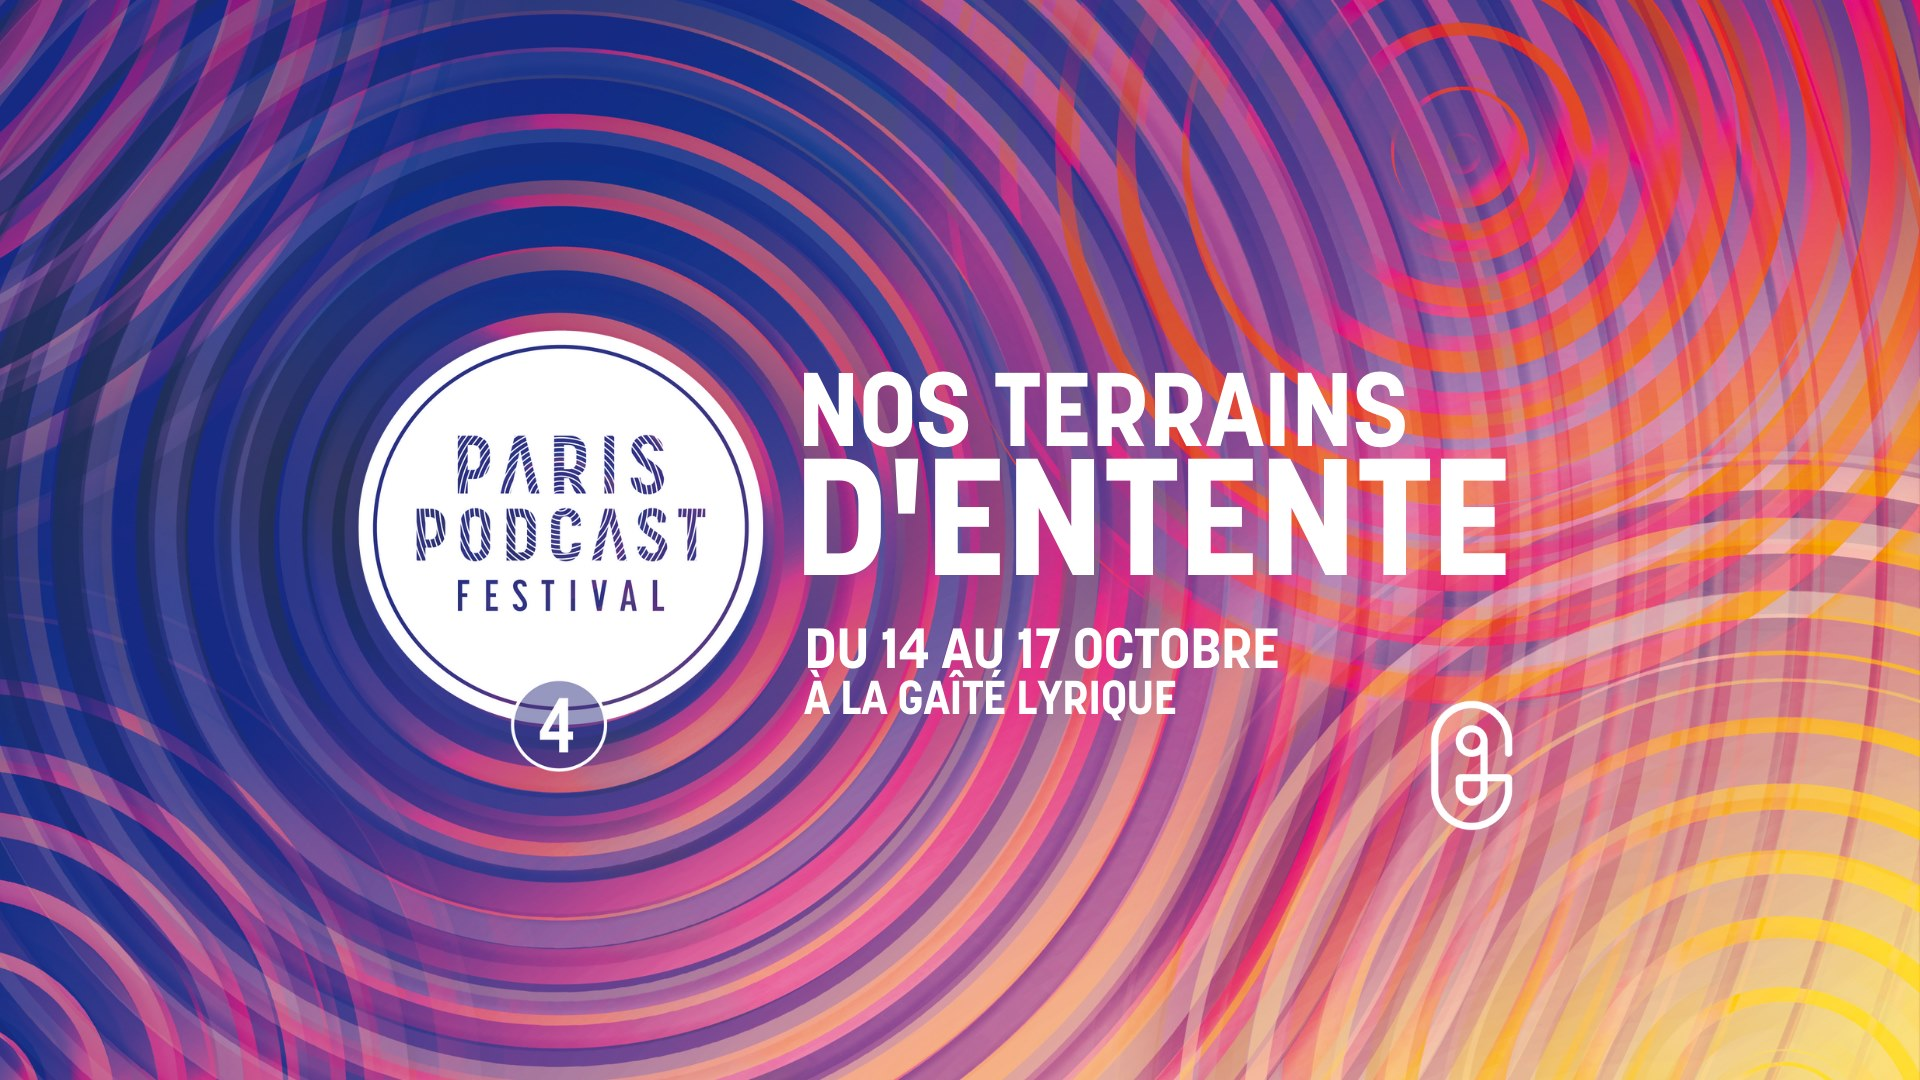 Paris podcast festival 4